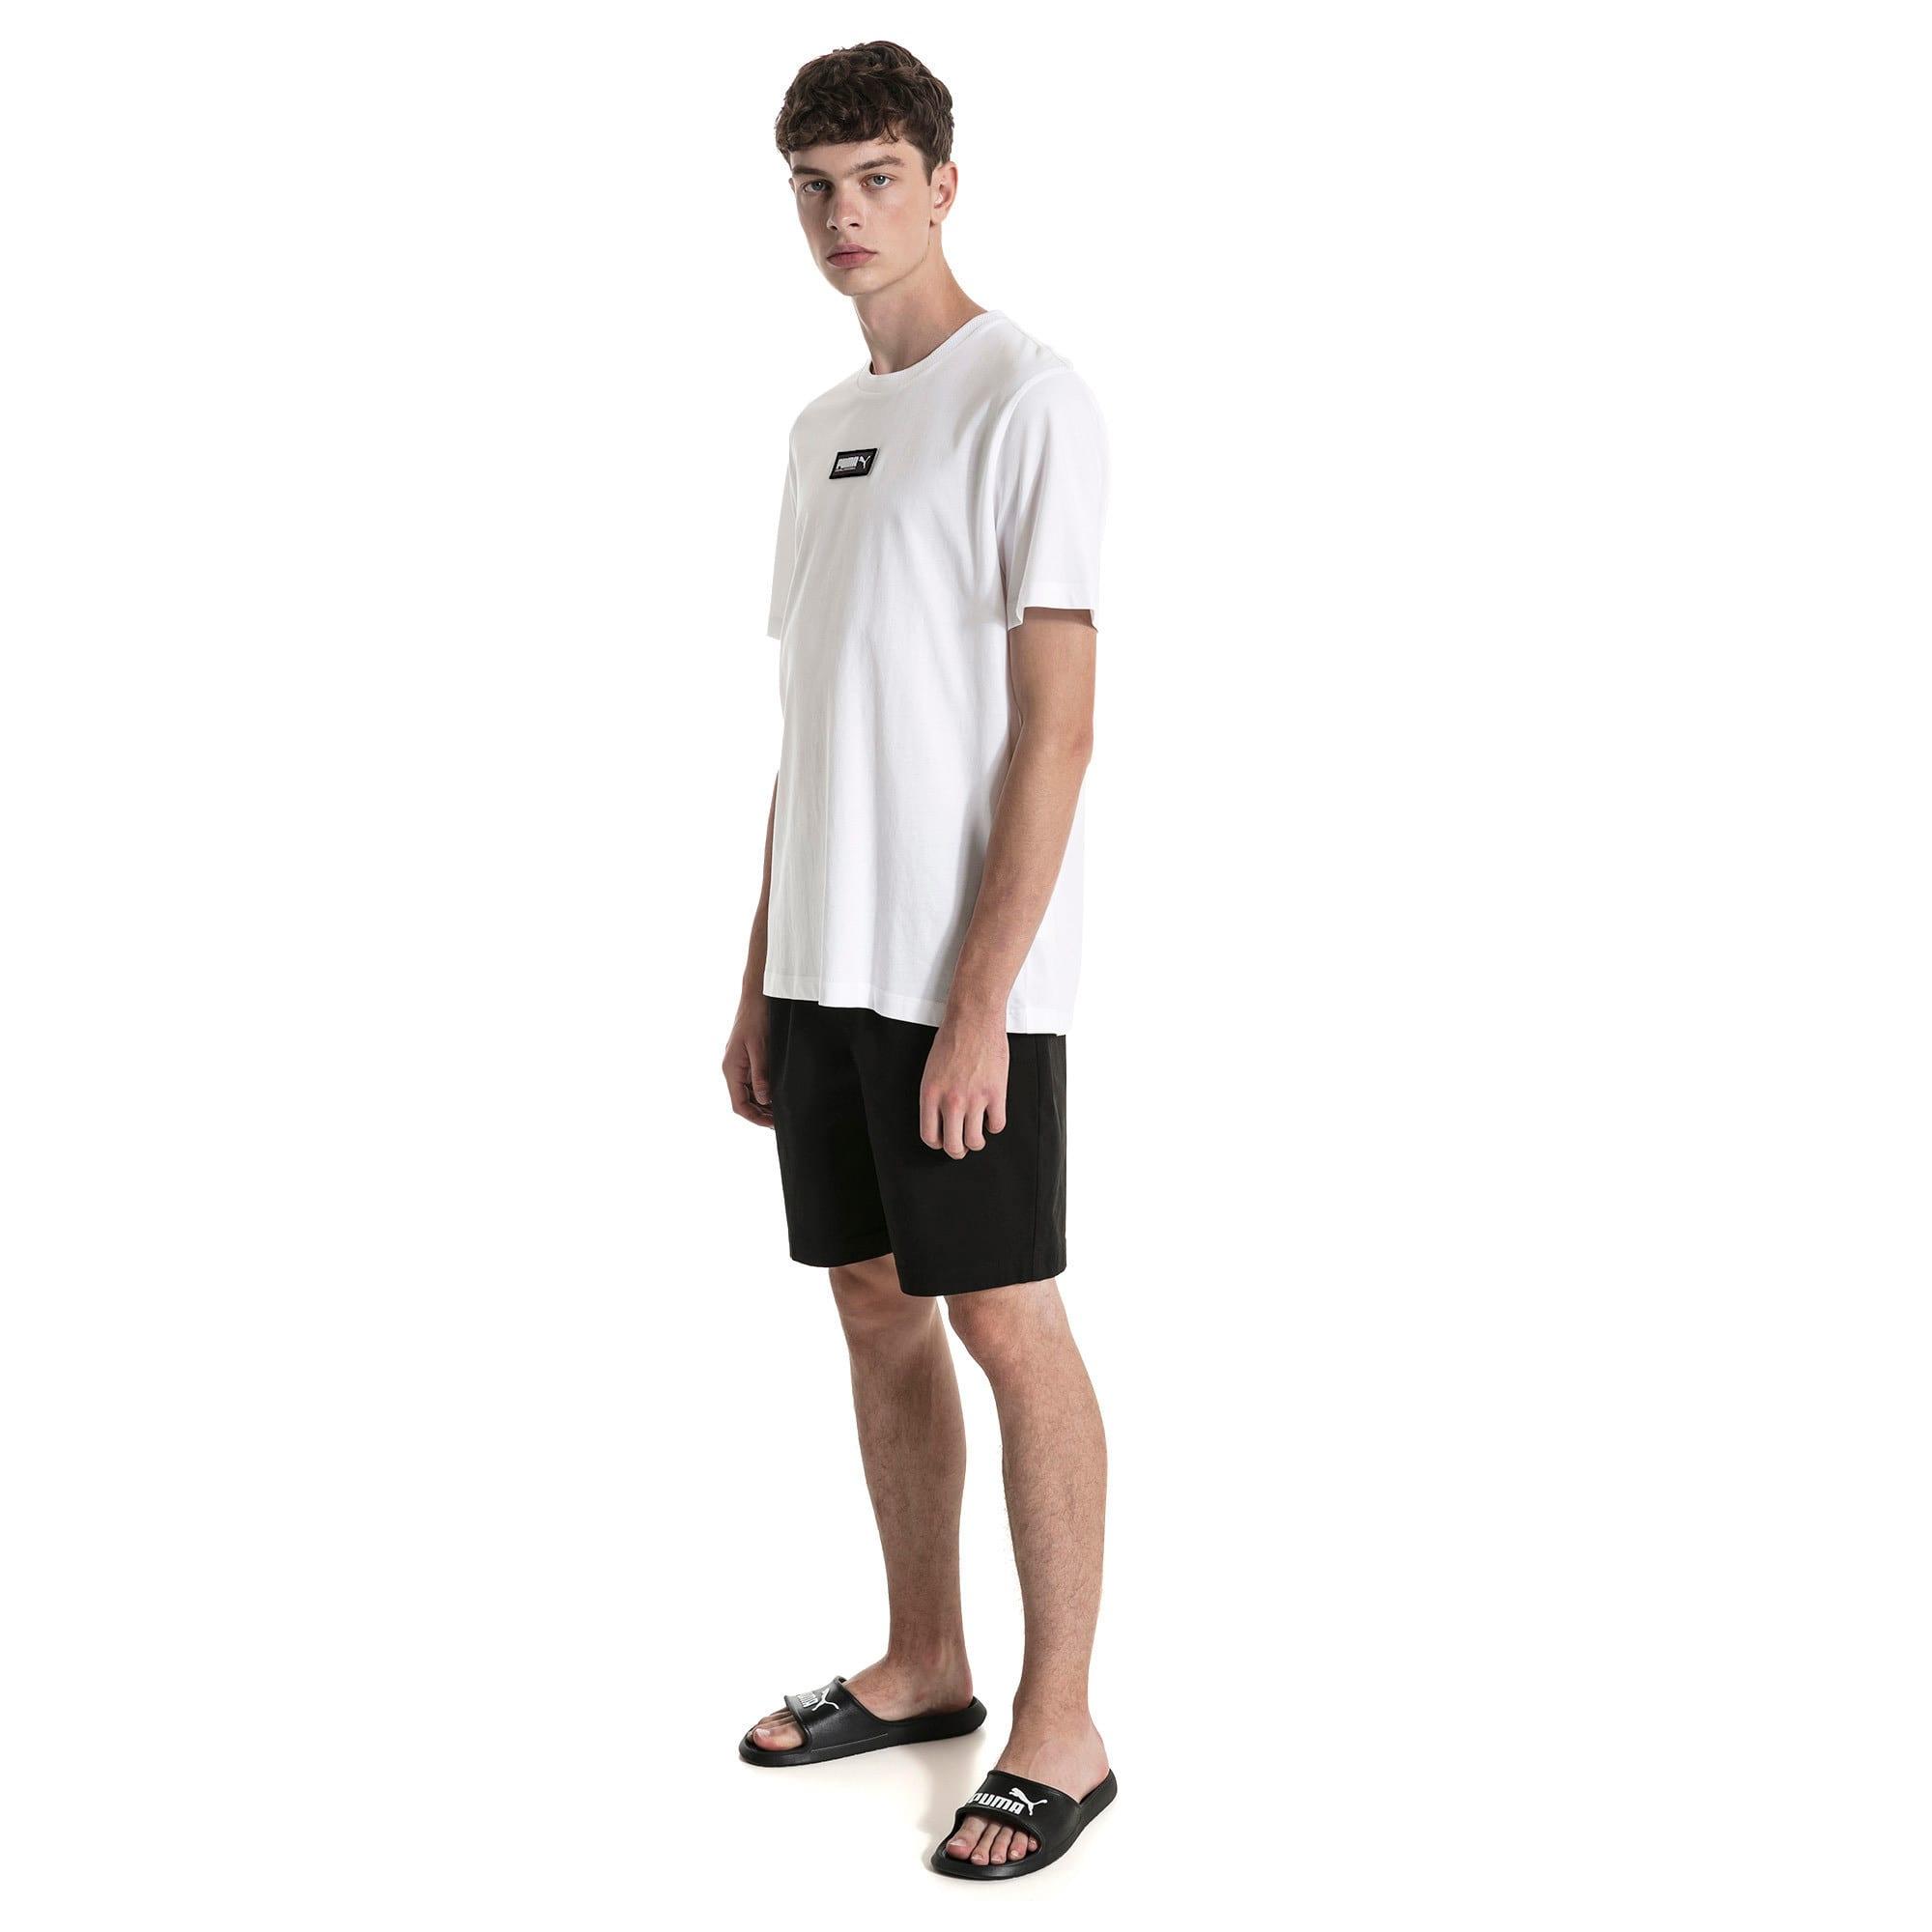 Thumbnail 3 of Fusion Men's Shorts, Puma Black, medium